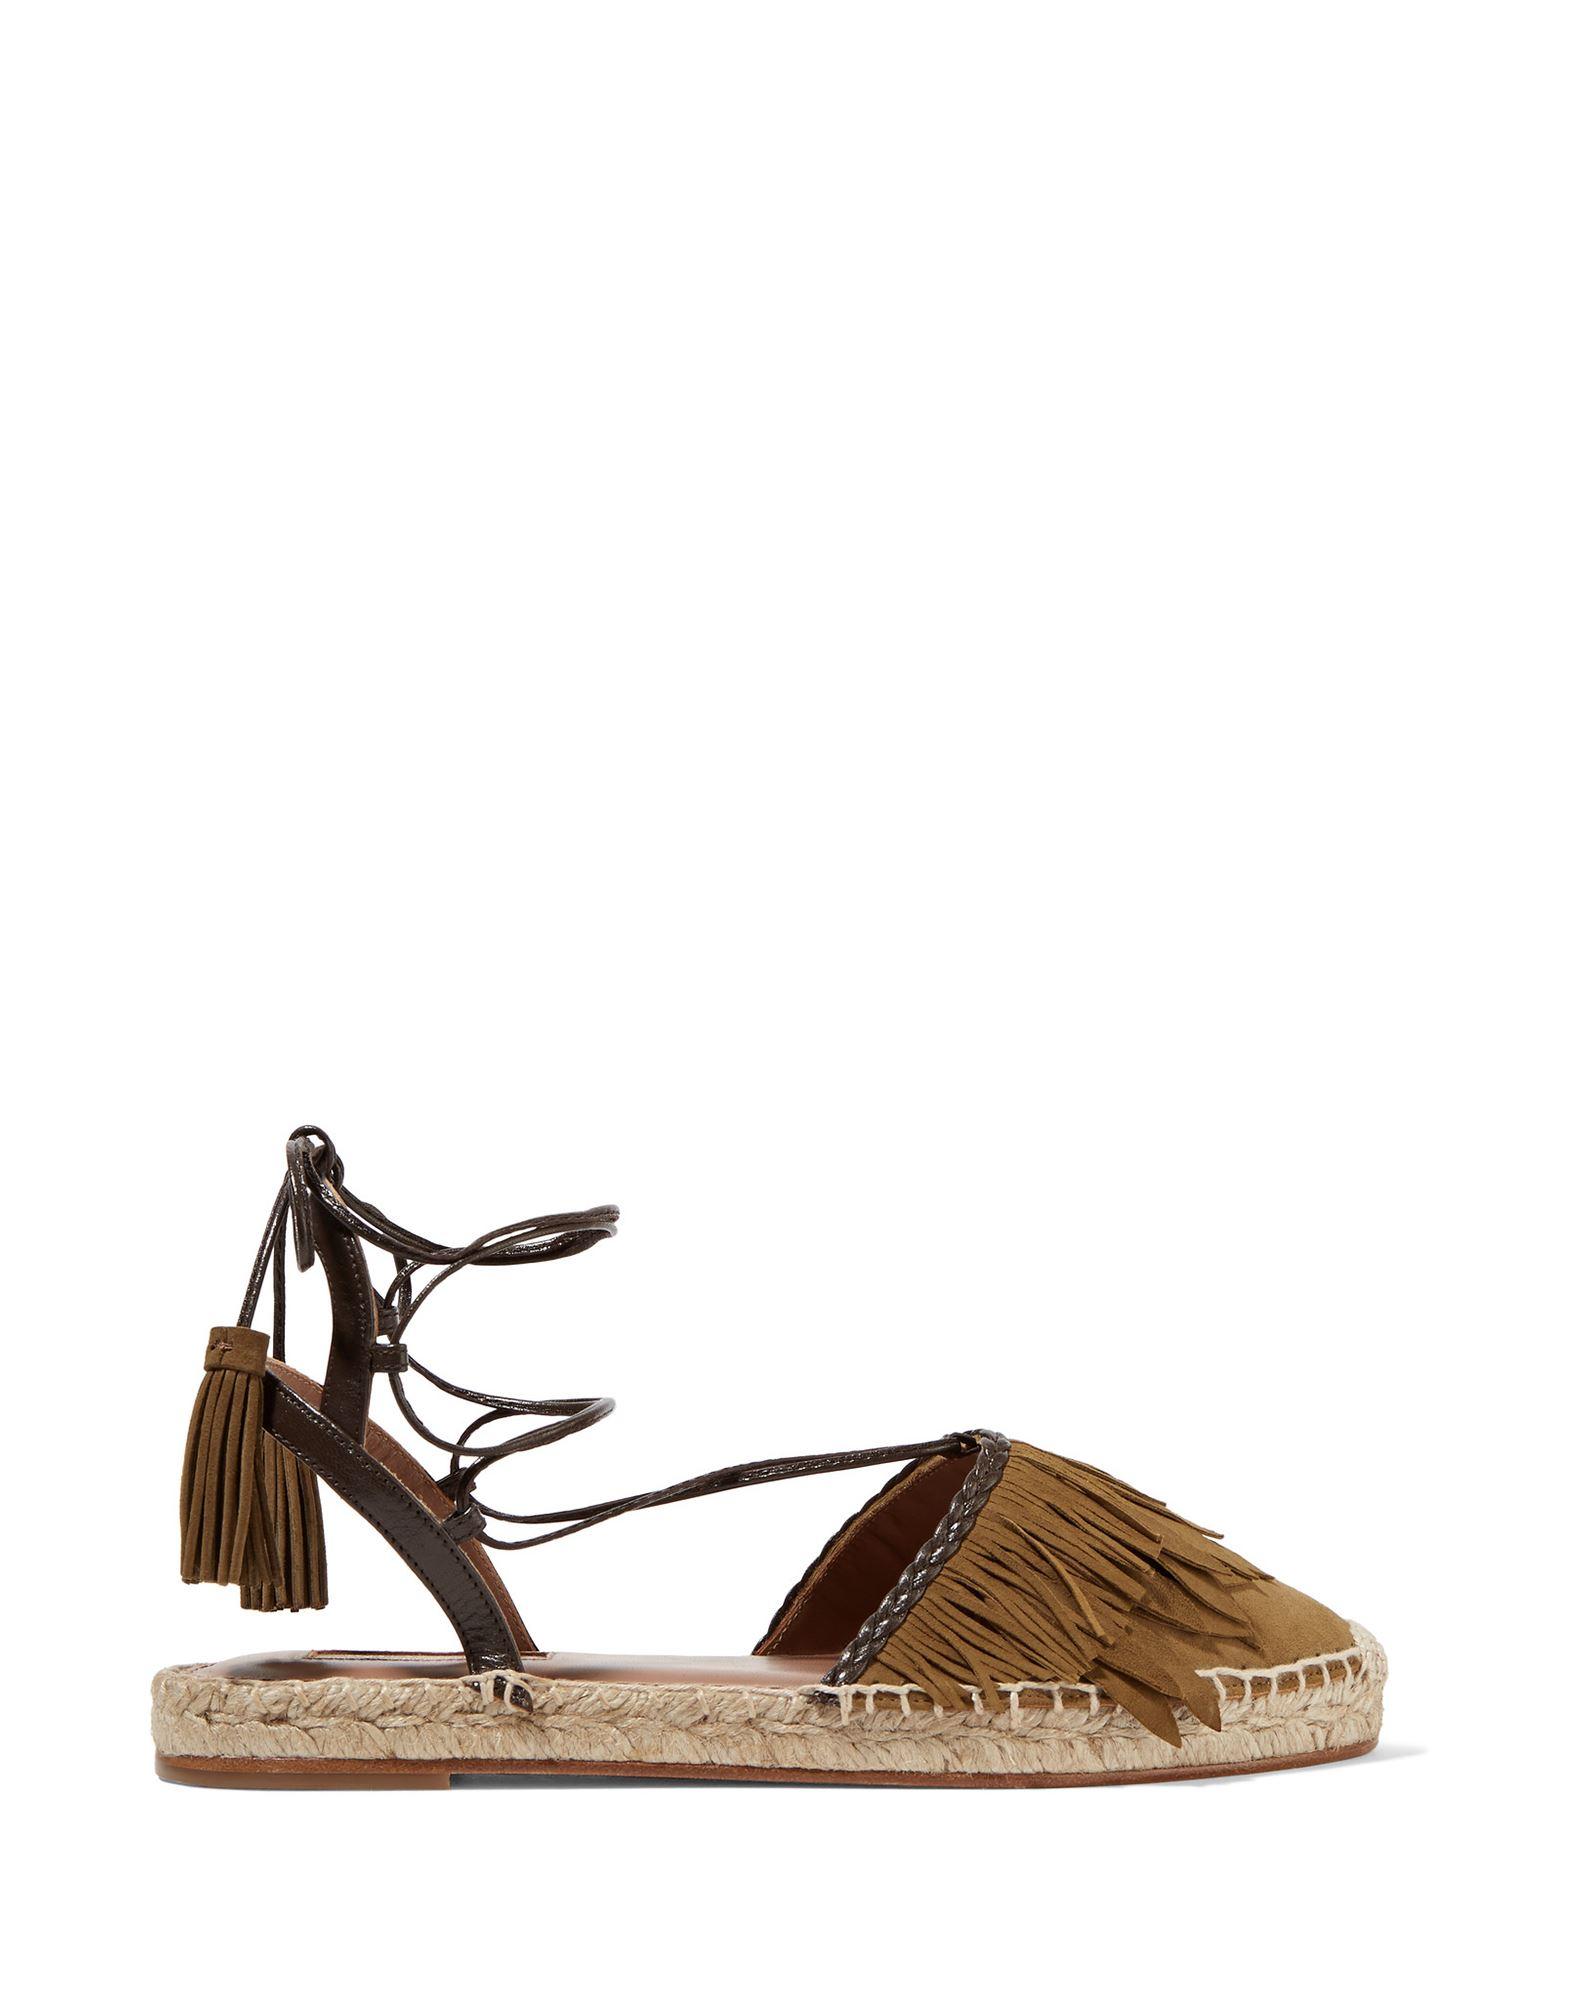 Aquazzura Espadrilles Damen  11268706IVGut aussehende strapazierfähige Schuhe